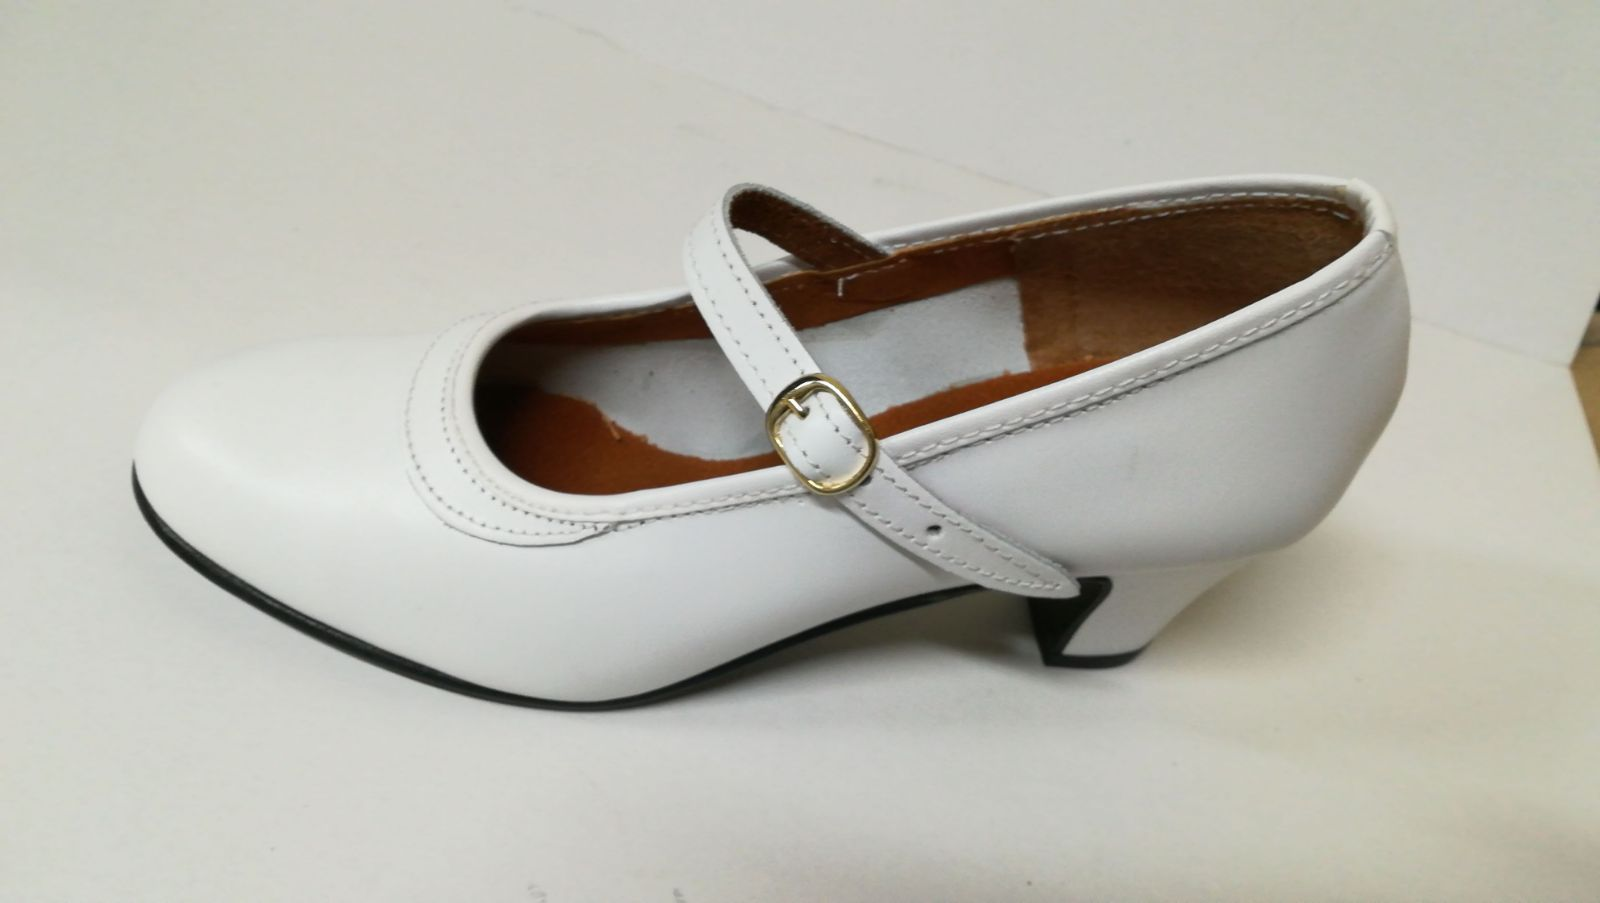 Zapato blanco: Productos de Calzados Malaca